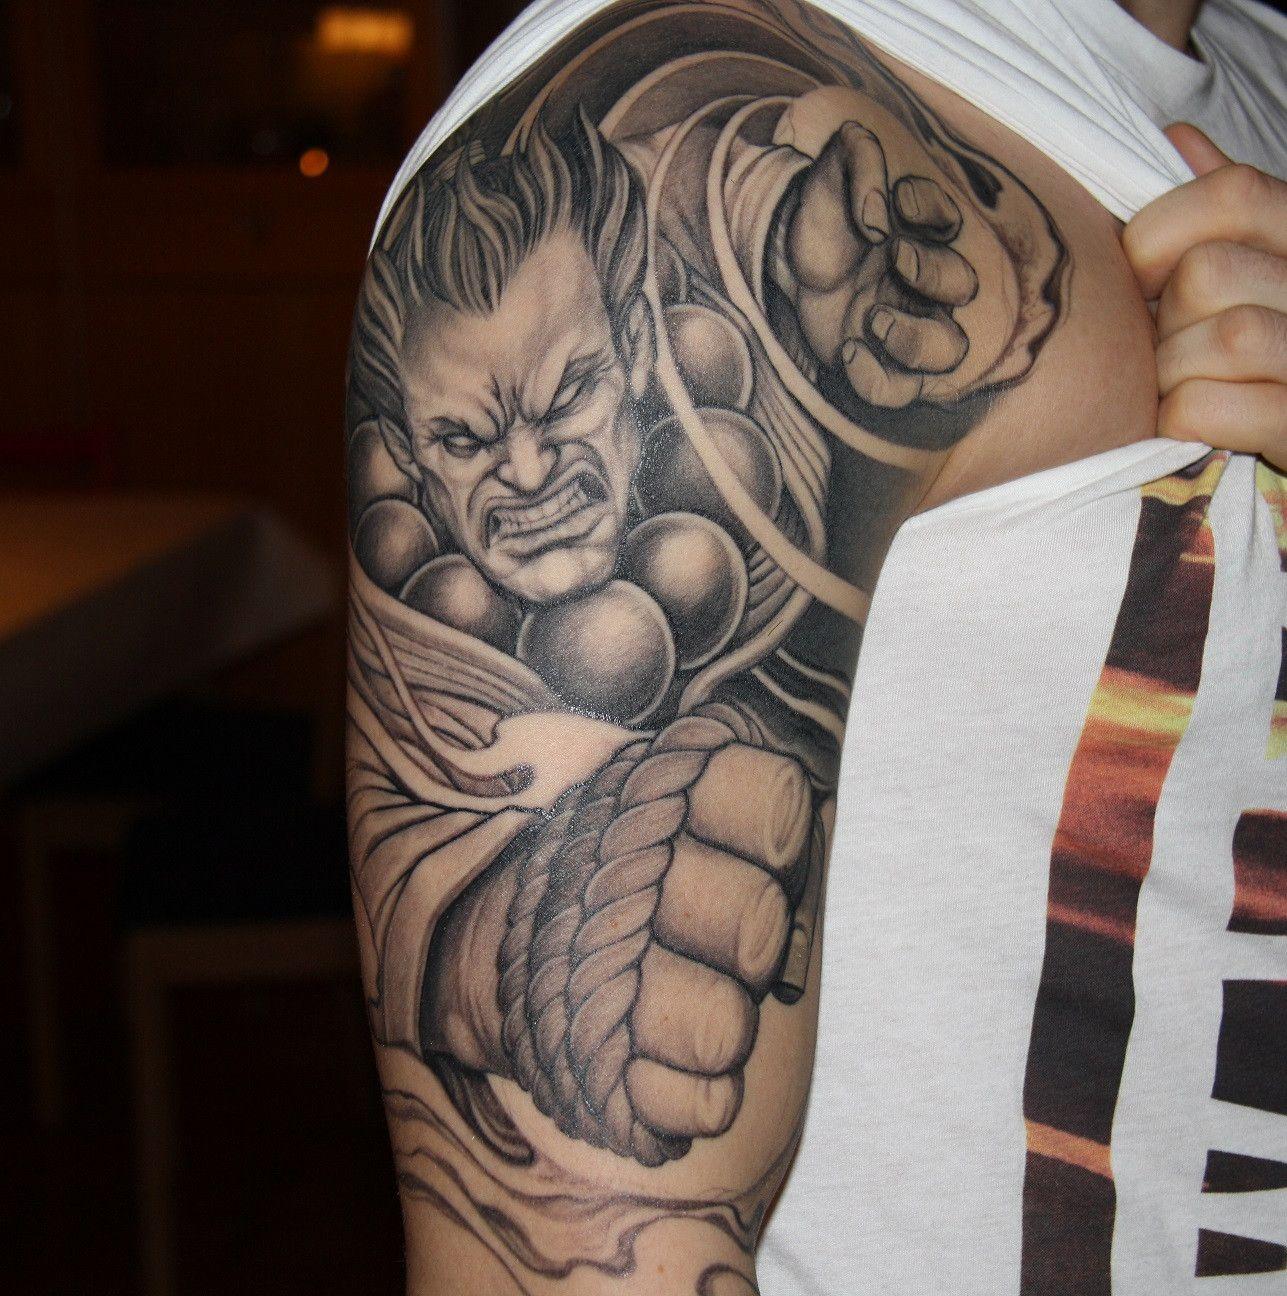 street fighter akuma tattoo imgur tattoos pinterest zumbis e tatuagens. Black Bedroom Furniture Sets. Home Design Ideas